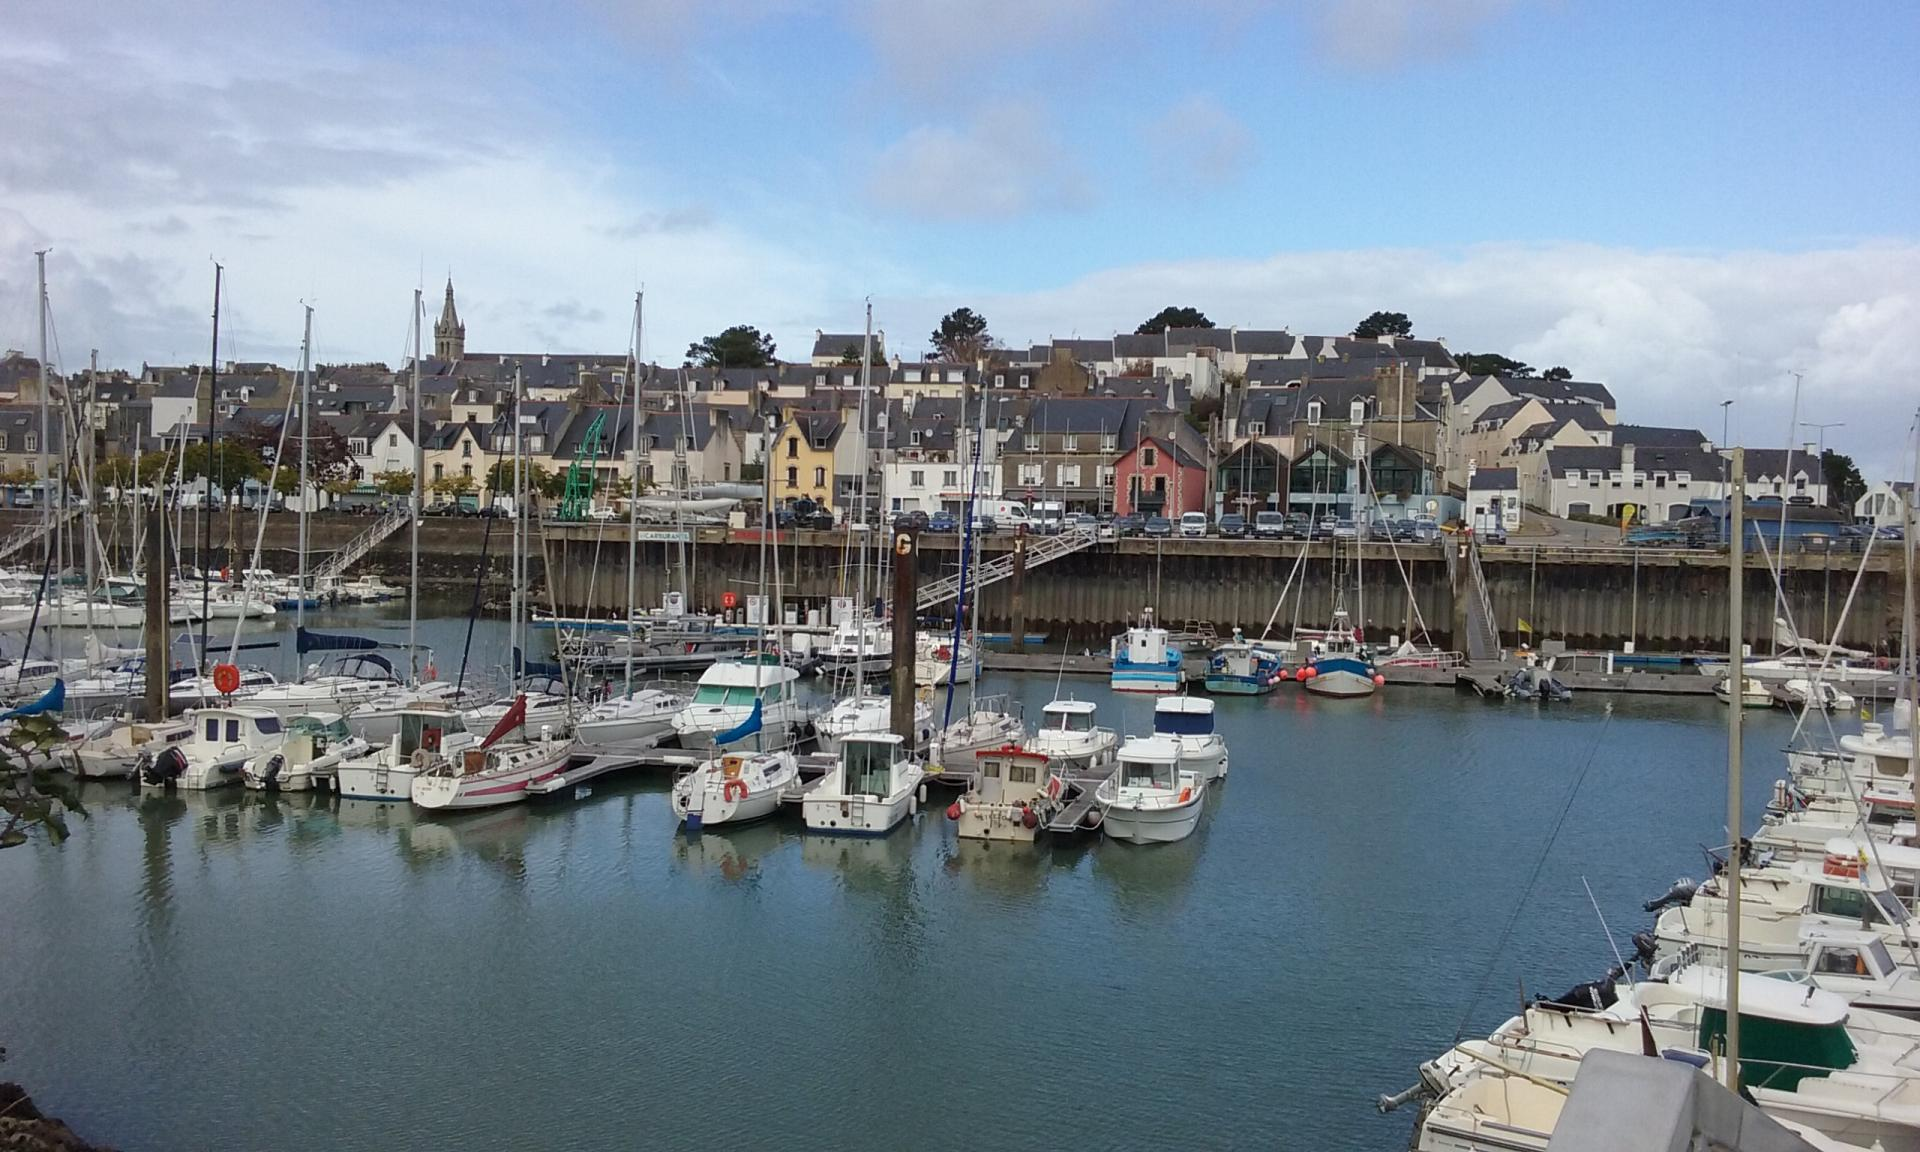 Port treboul